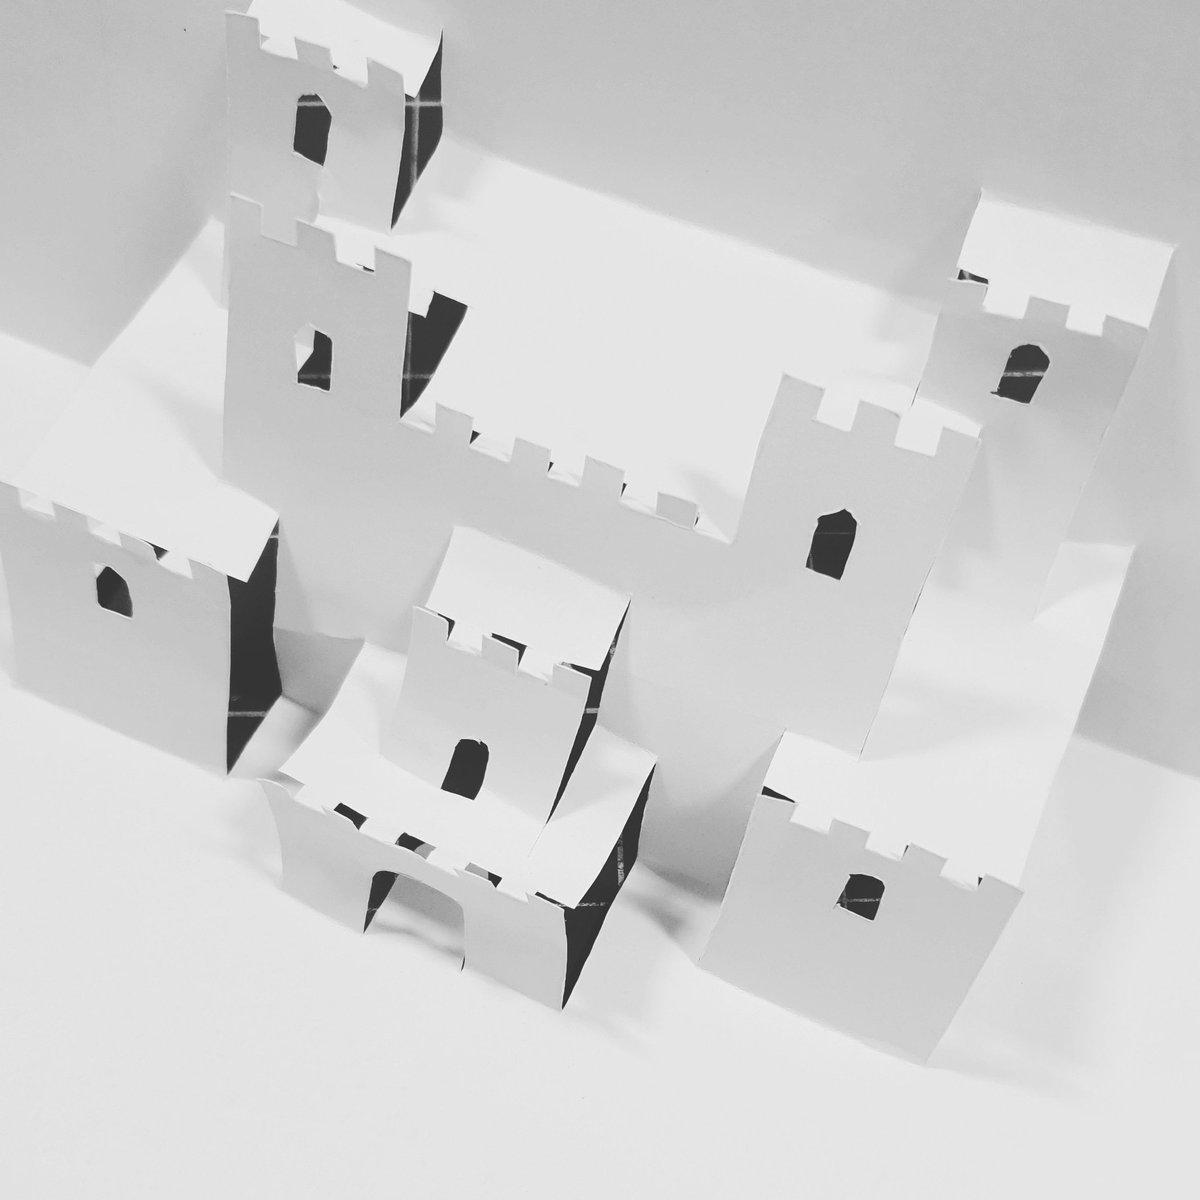 Ever tried making one of these pop up sculptures from popupology? Even the simplest ones are super fun to make.  #artist #art #artwork #sculpture #popupcard #fineart #arteducation #artteacher #londonartist #ukartist #3dart #popupart